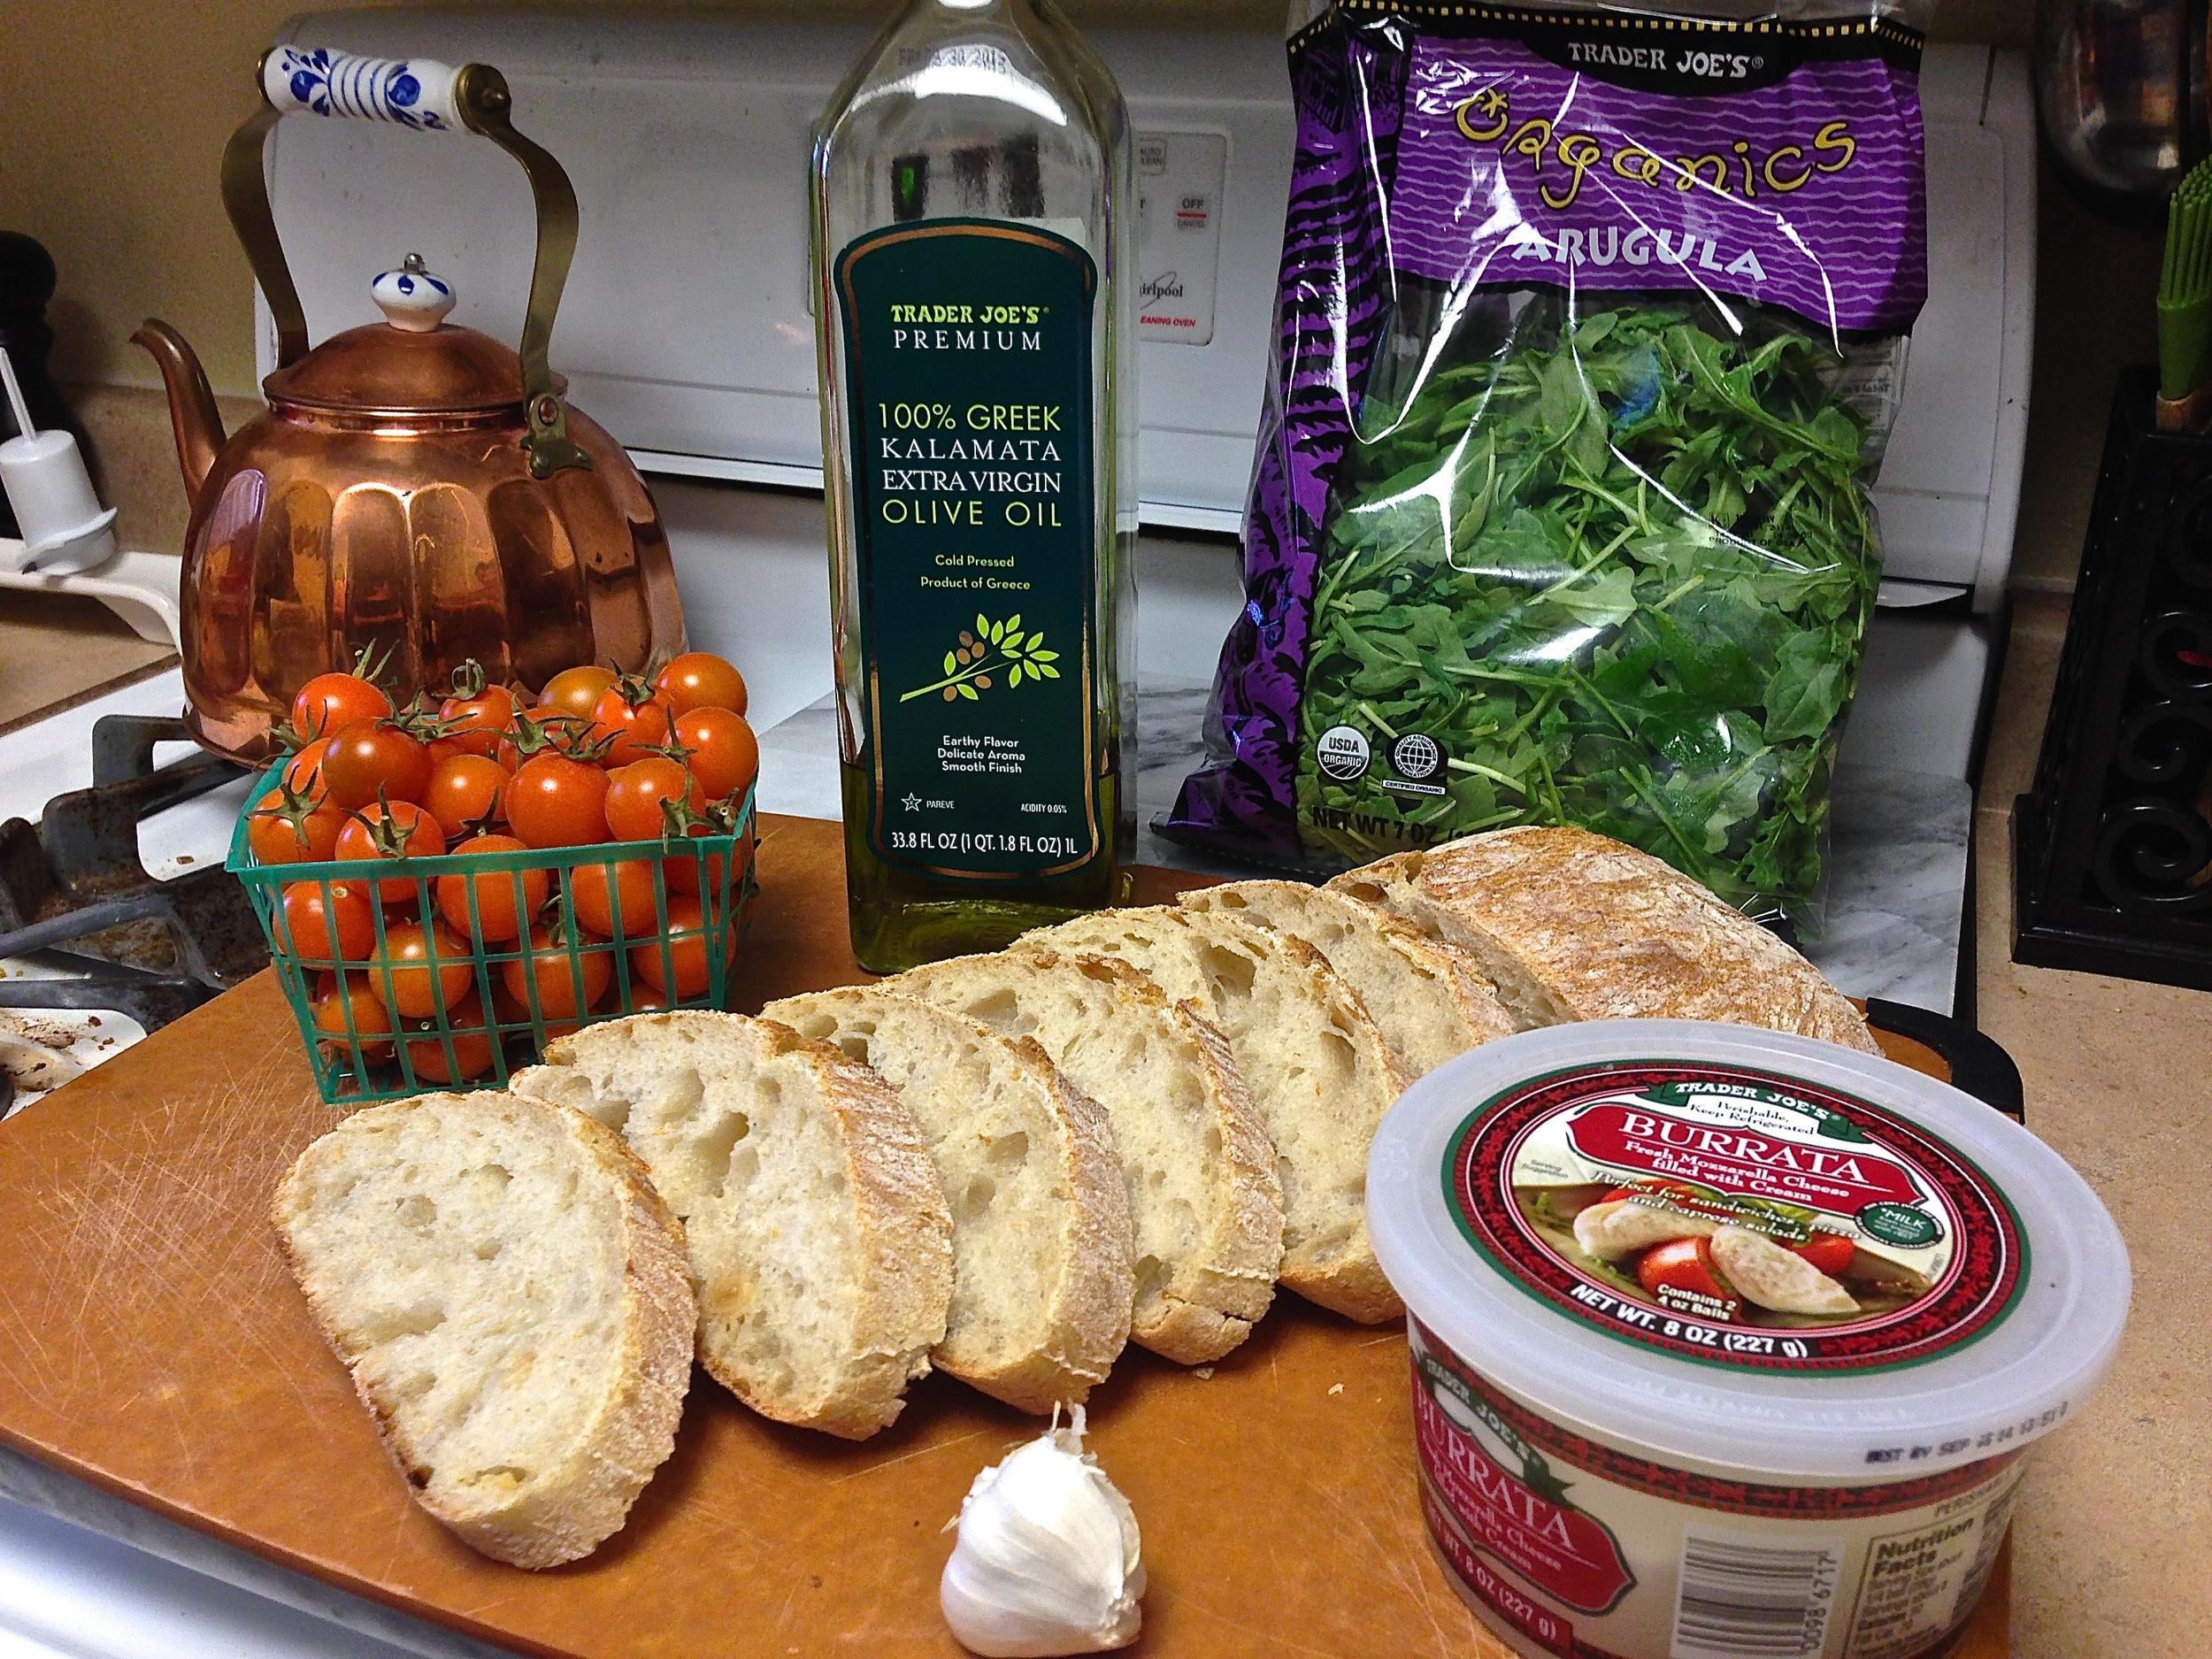 Burrata & Roasted Cherry Tomato Crostini by Kneading Home